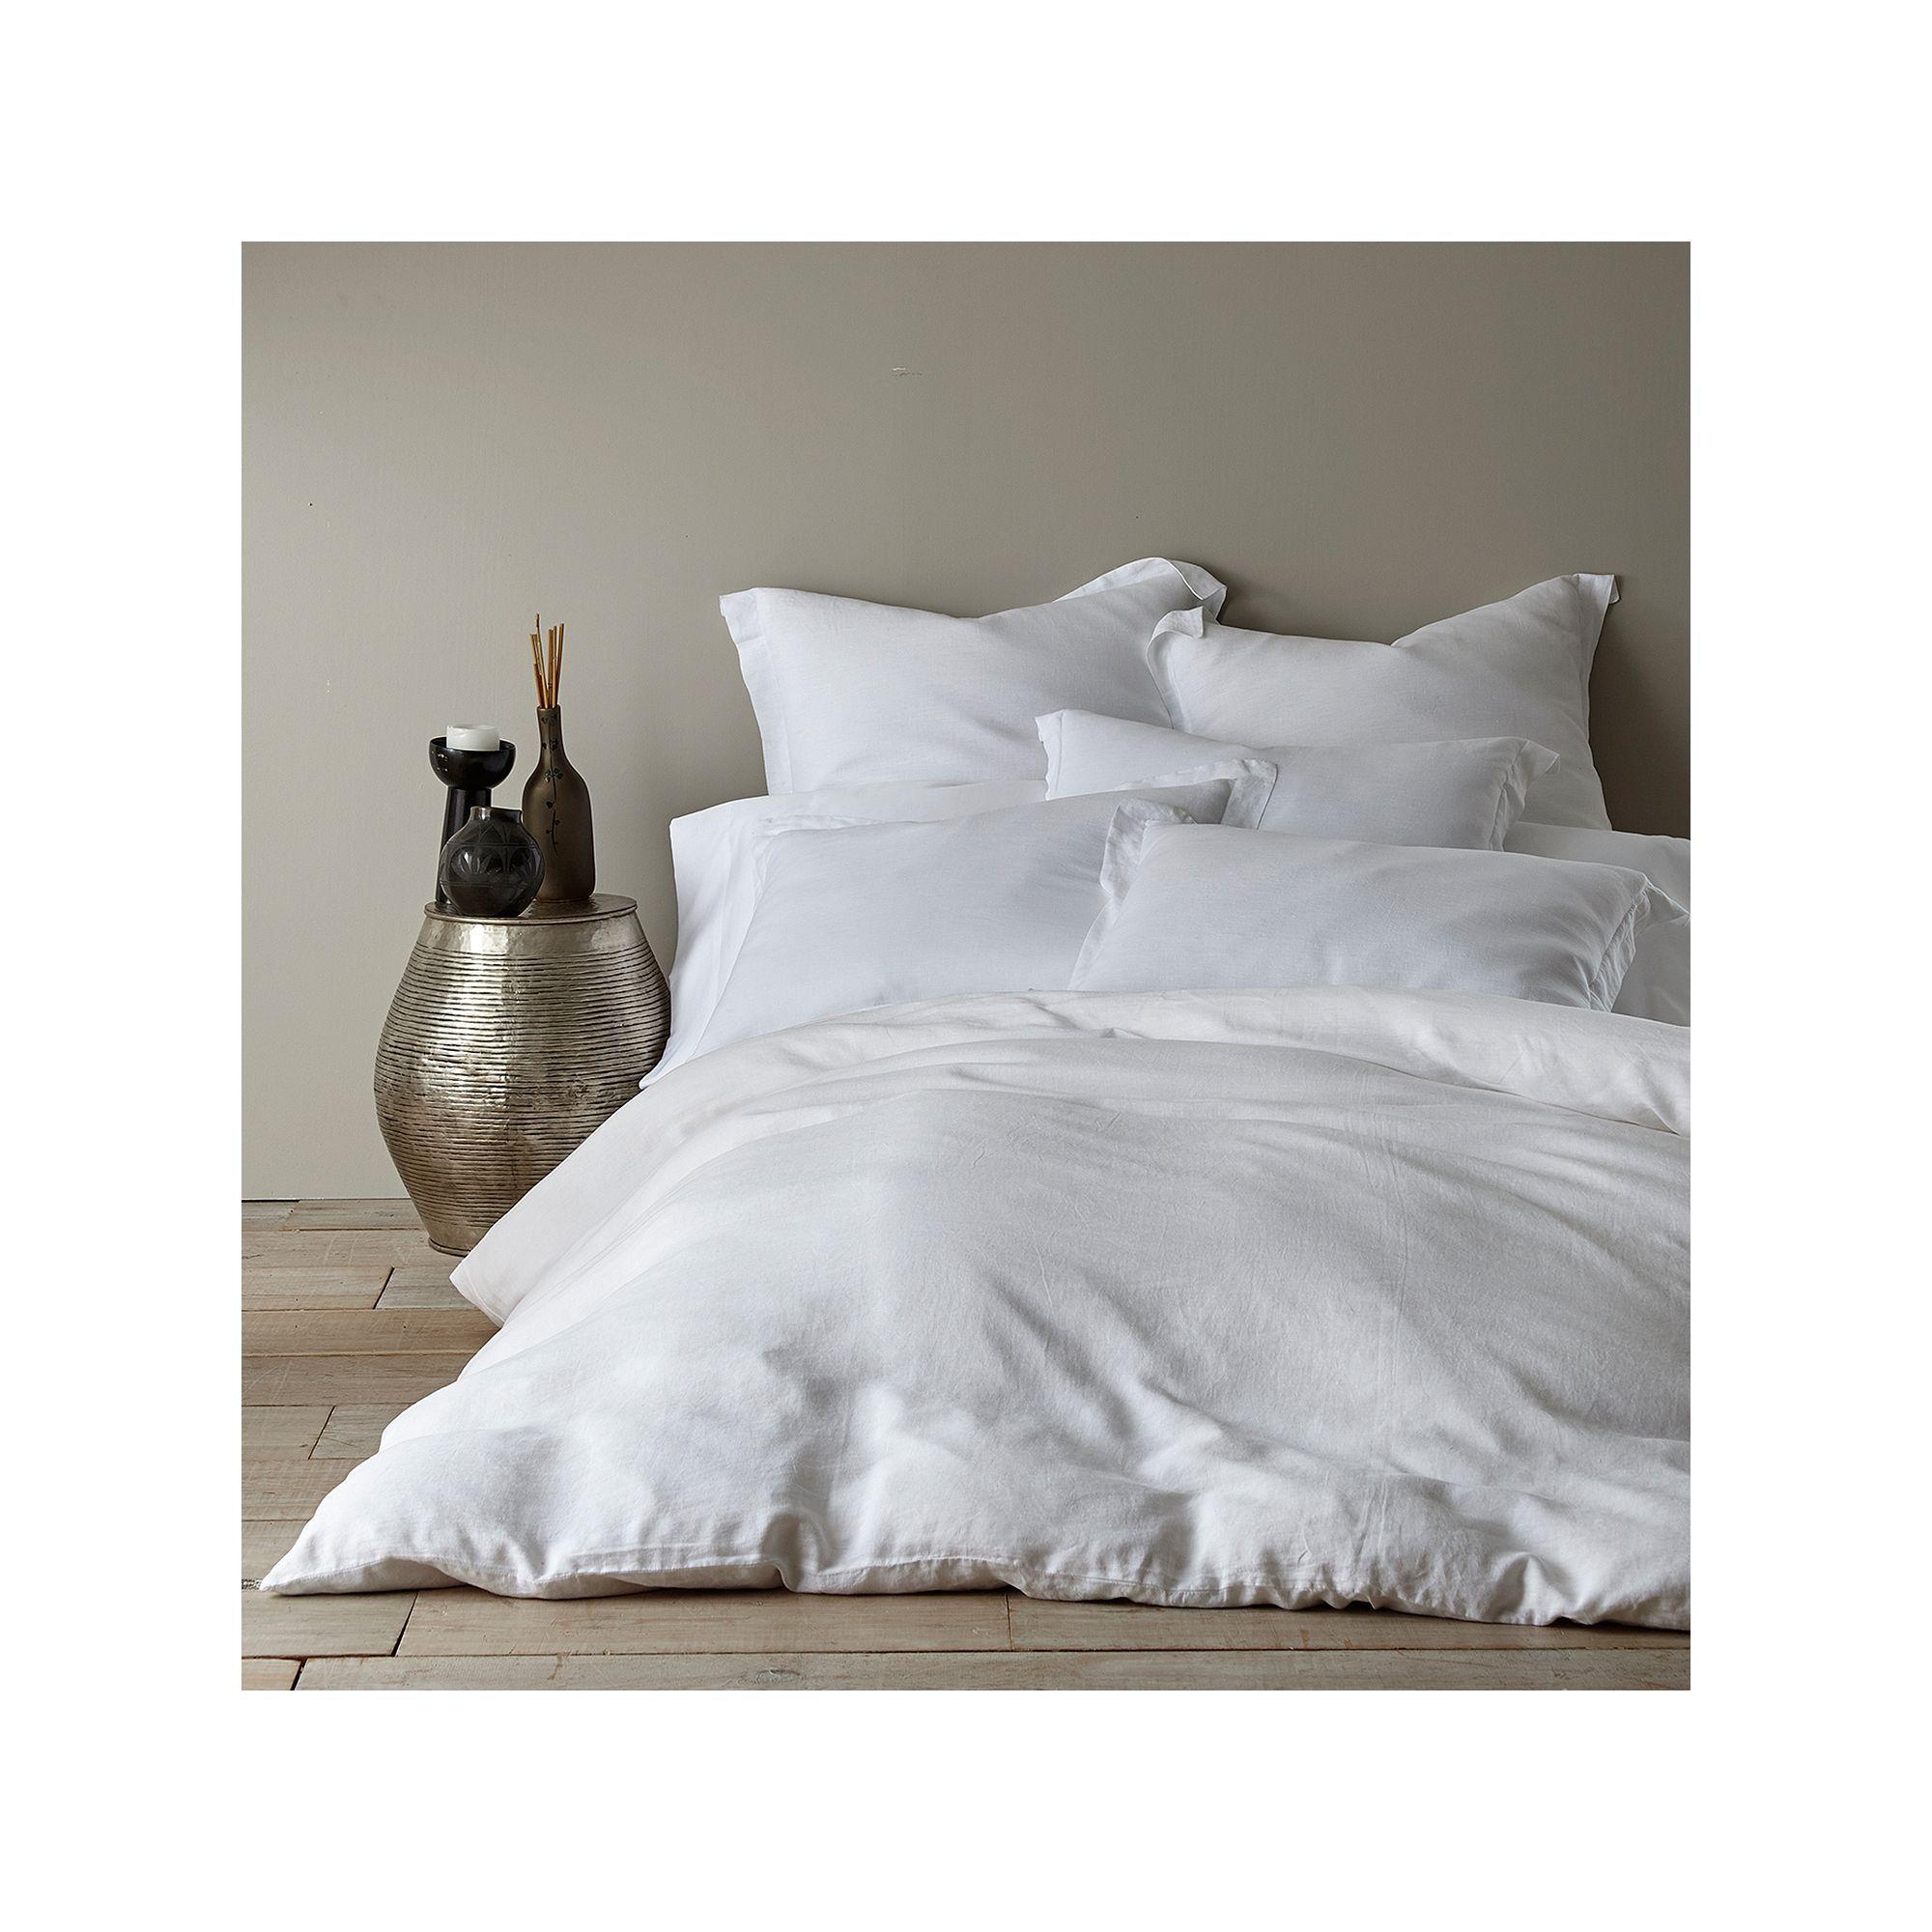 Washed Linen Duvet Cover, White